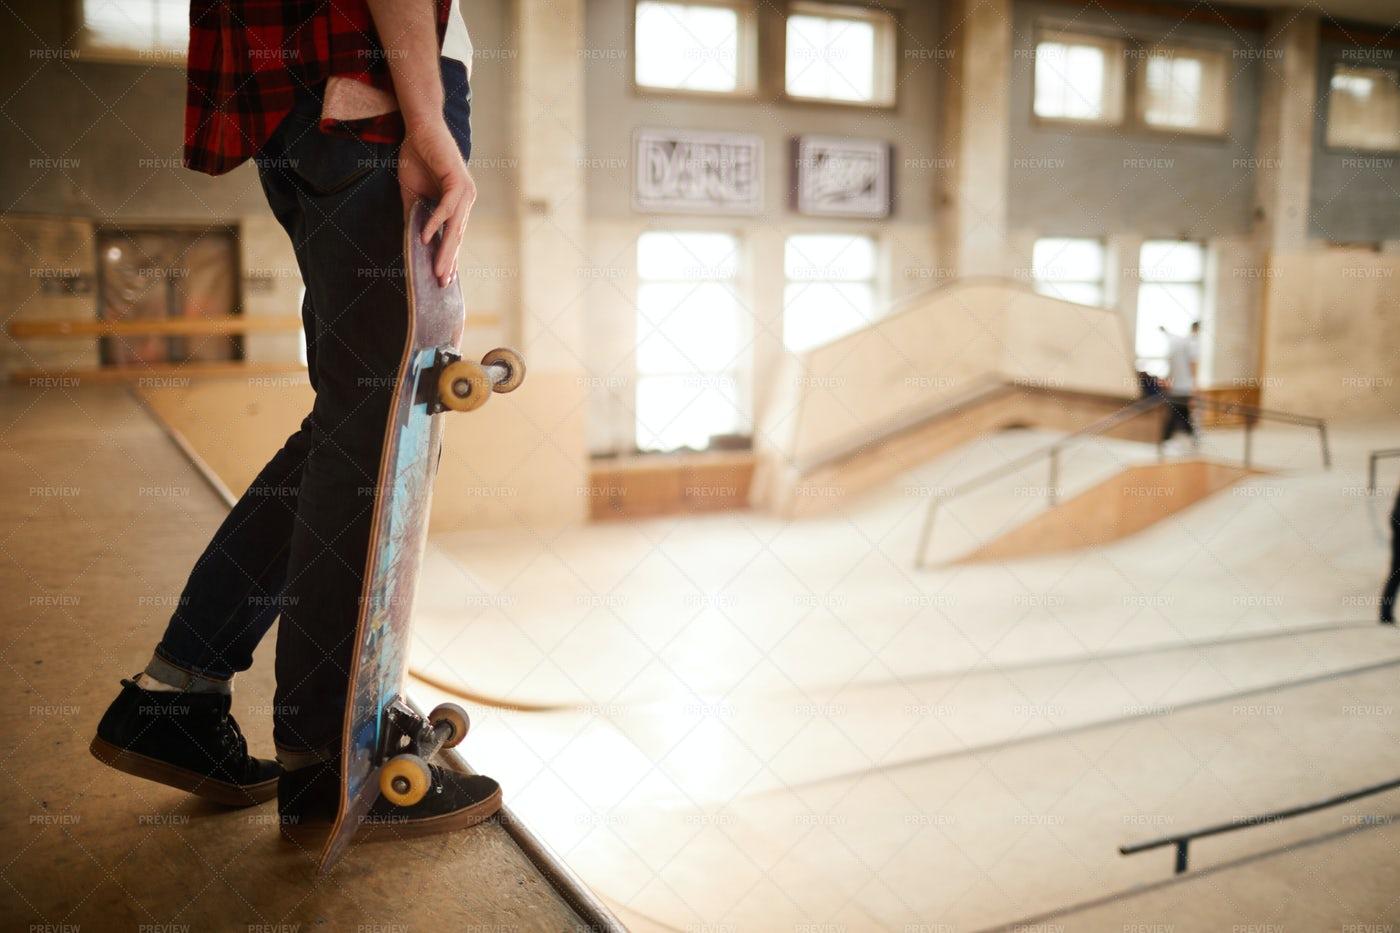 Skater Standing On Ramp: Stock Photos